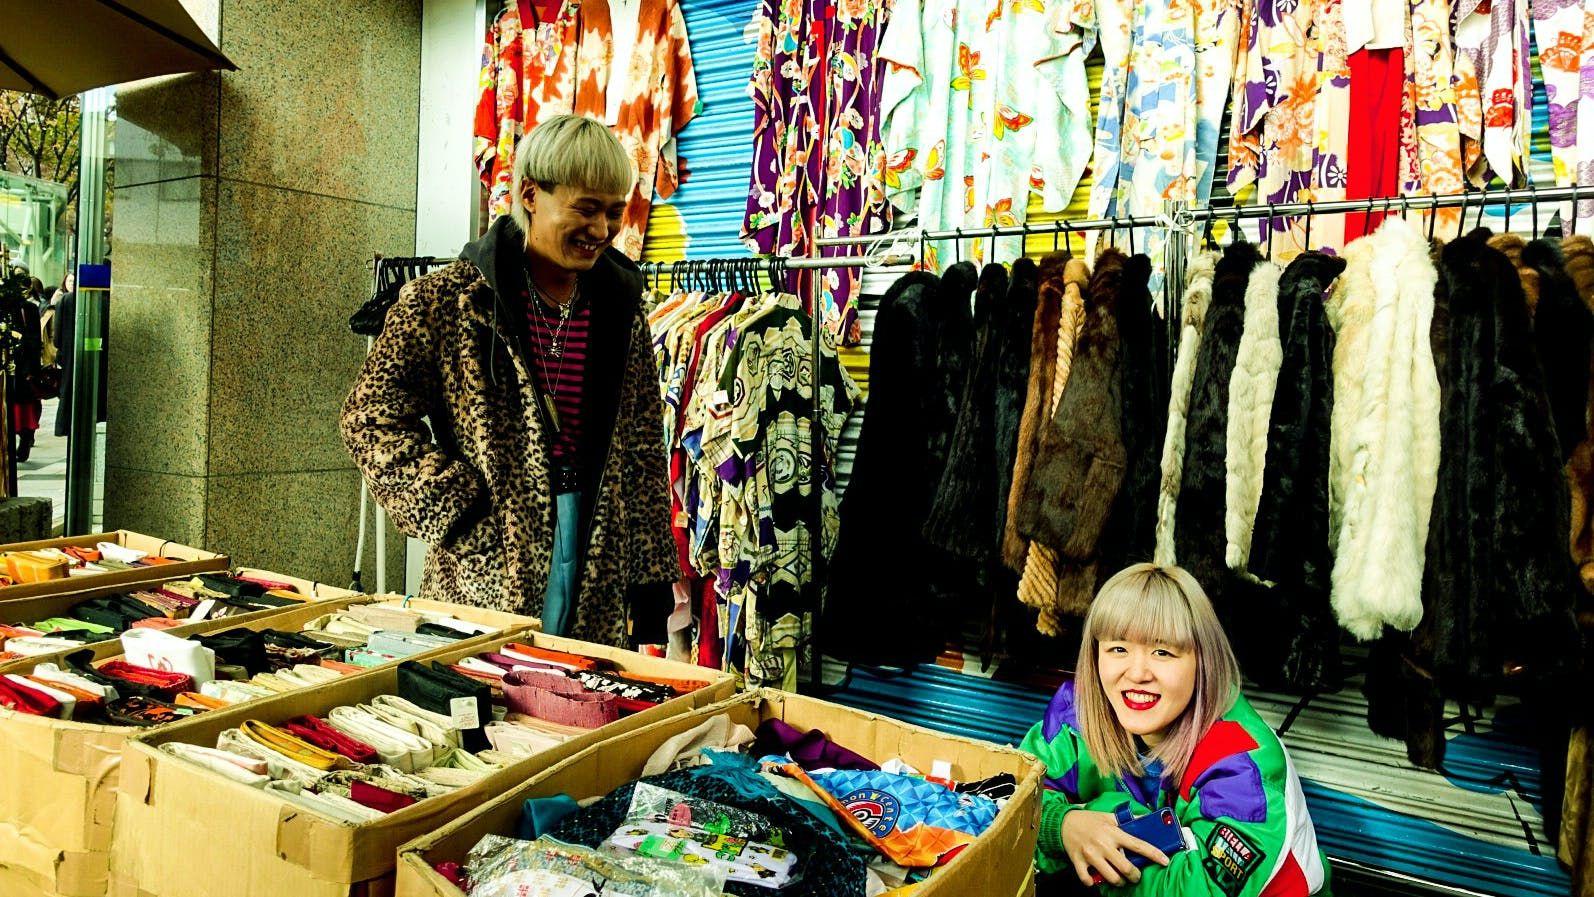 Tips Belanja Baju di Pasar Senen, Tetap Aman, Nyaman dan Anti Boros